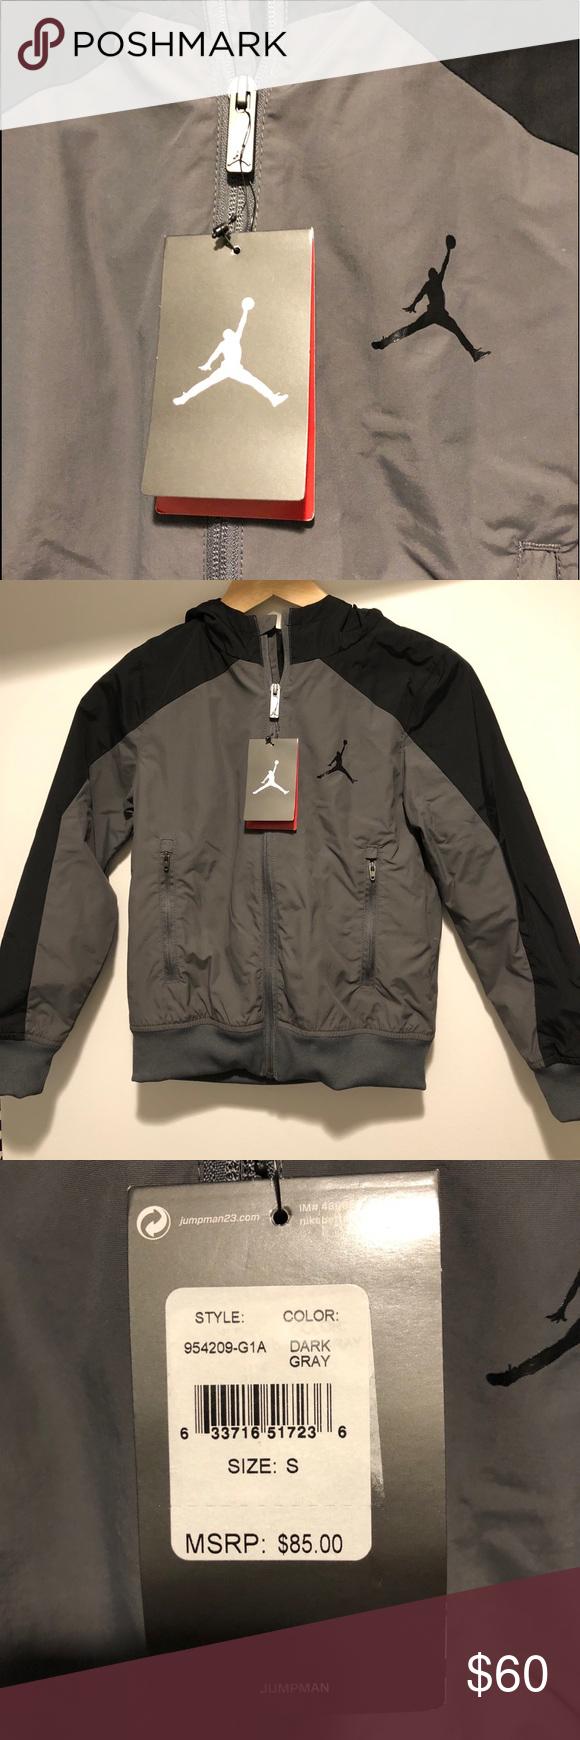 cb657c7e284c NWT Boys Jordan Jumpman Jacket- Size S (8-10yrs)! New W  Tags! Boys Size  Small. Dark Grey + Black Jacket w  Hood zippered Front w  Two Zippered  Pockets.